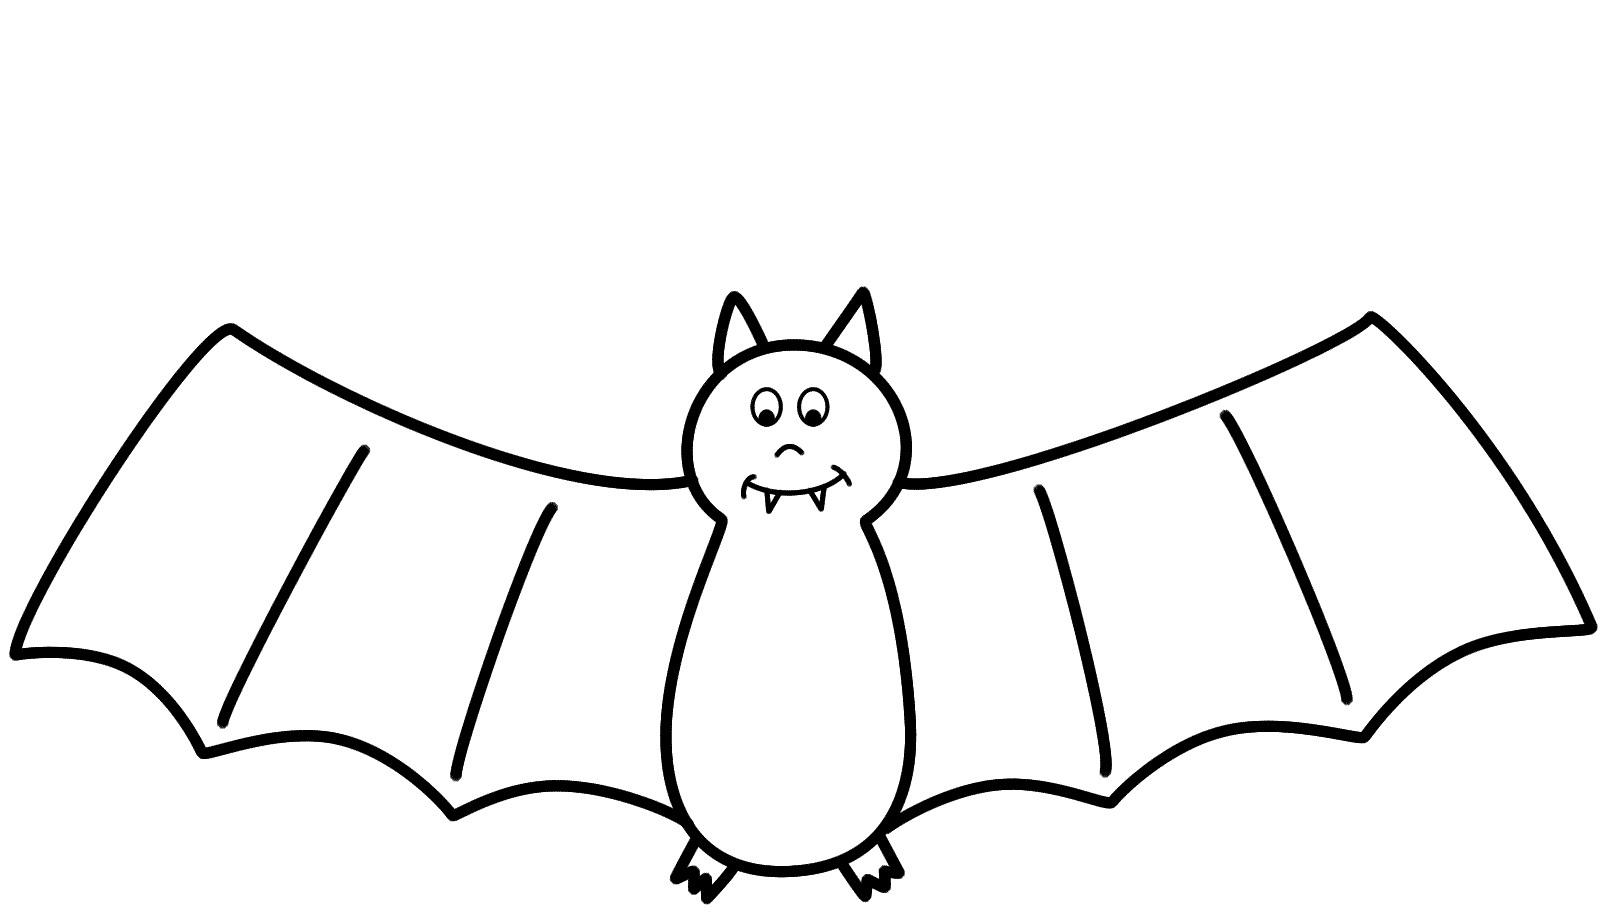 Bat Drawing Outline At Getdrawings